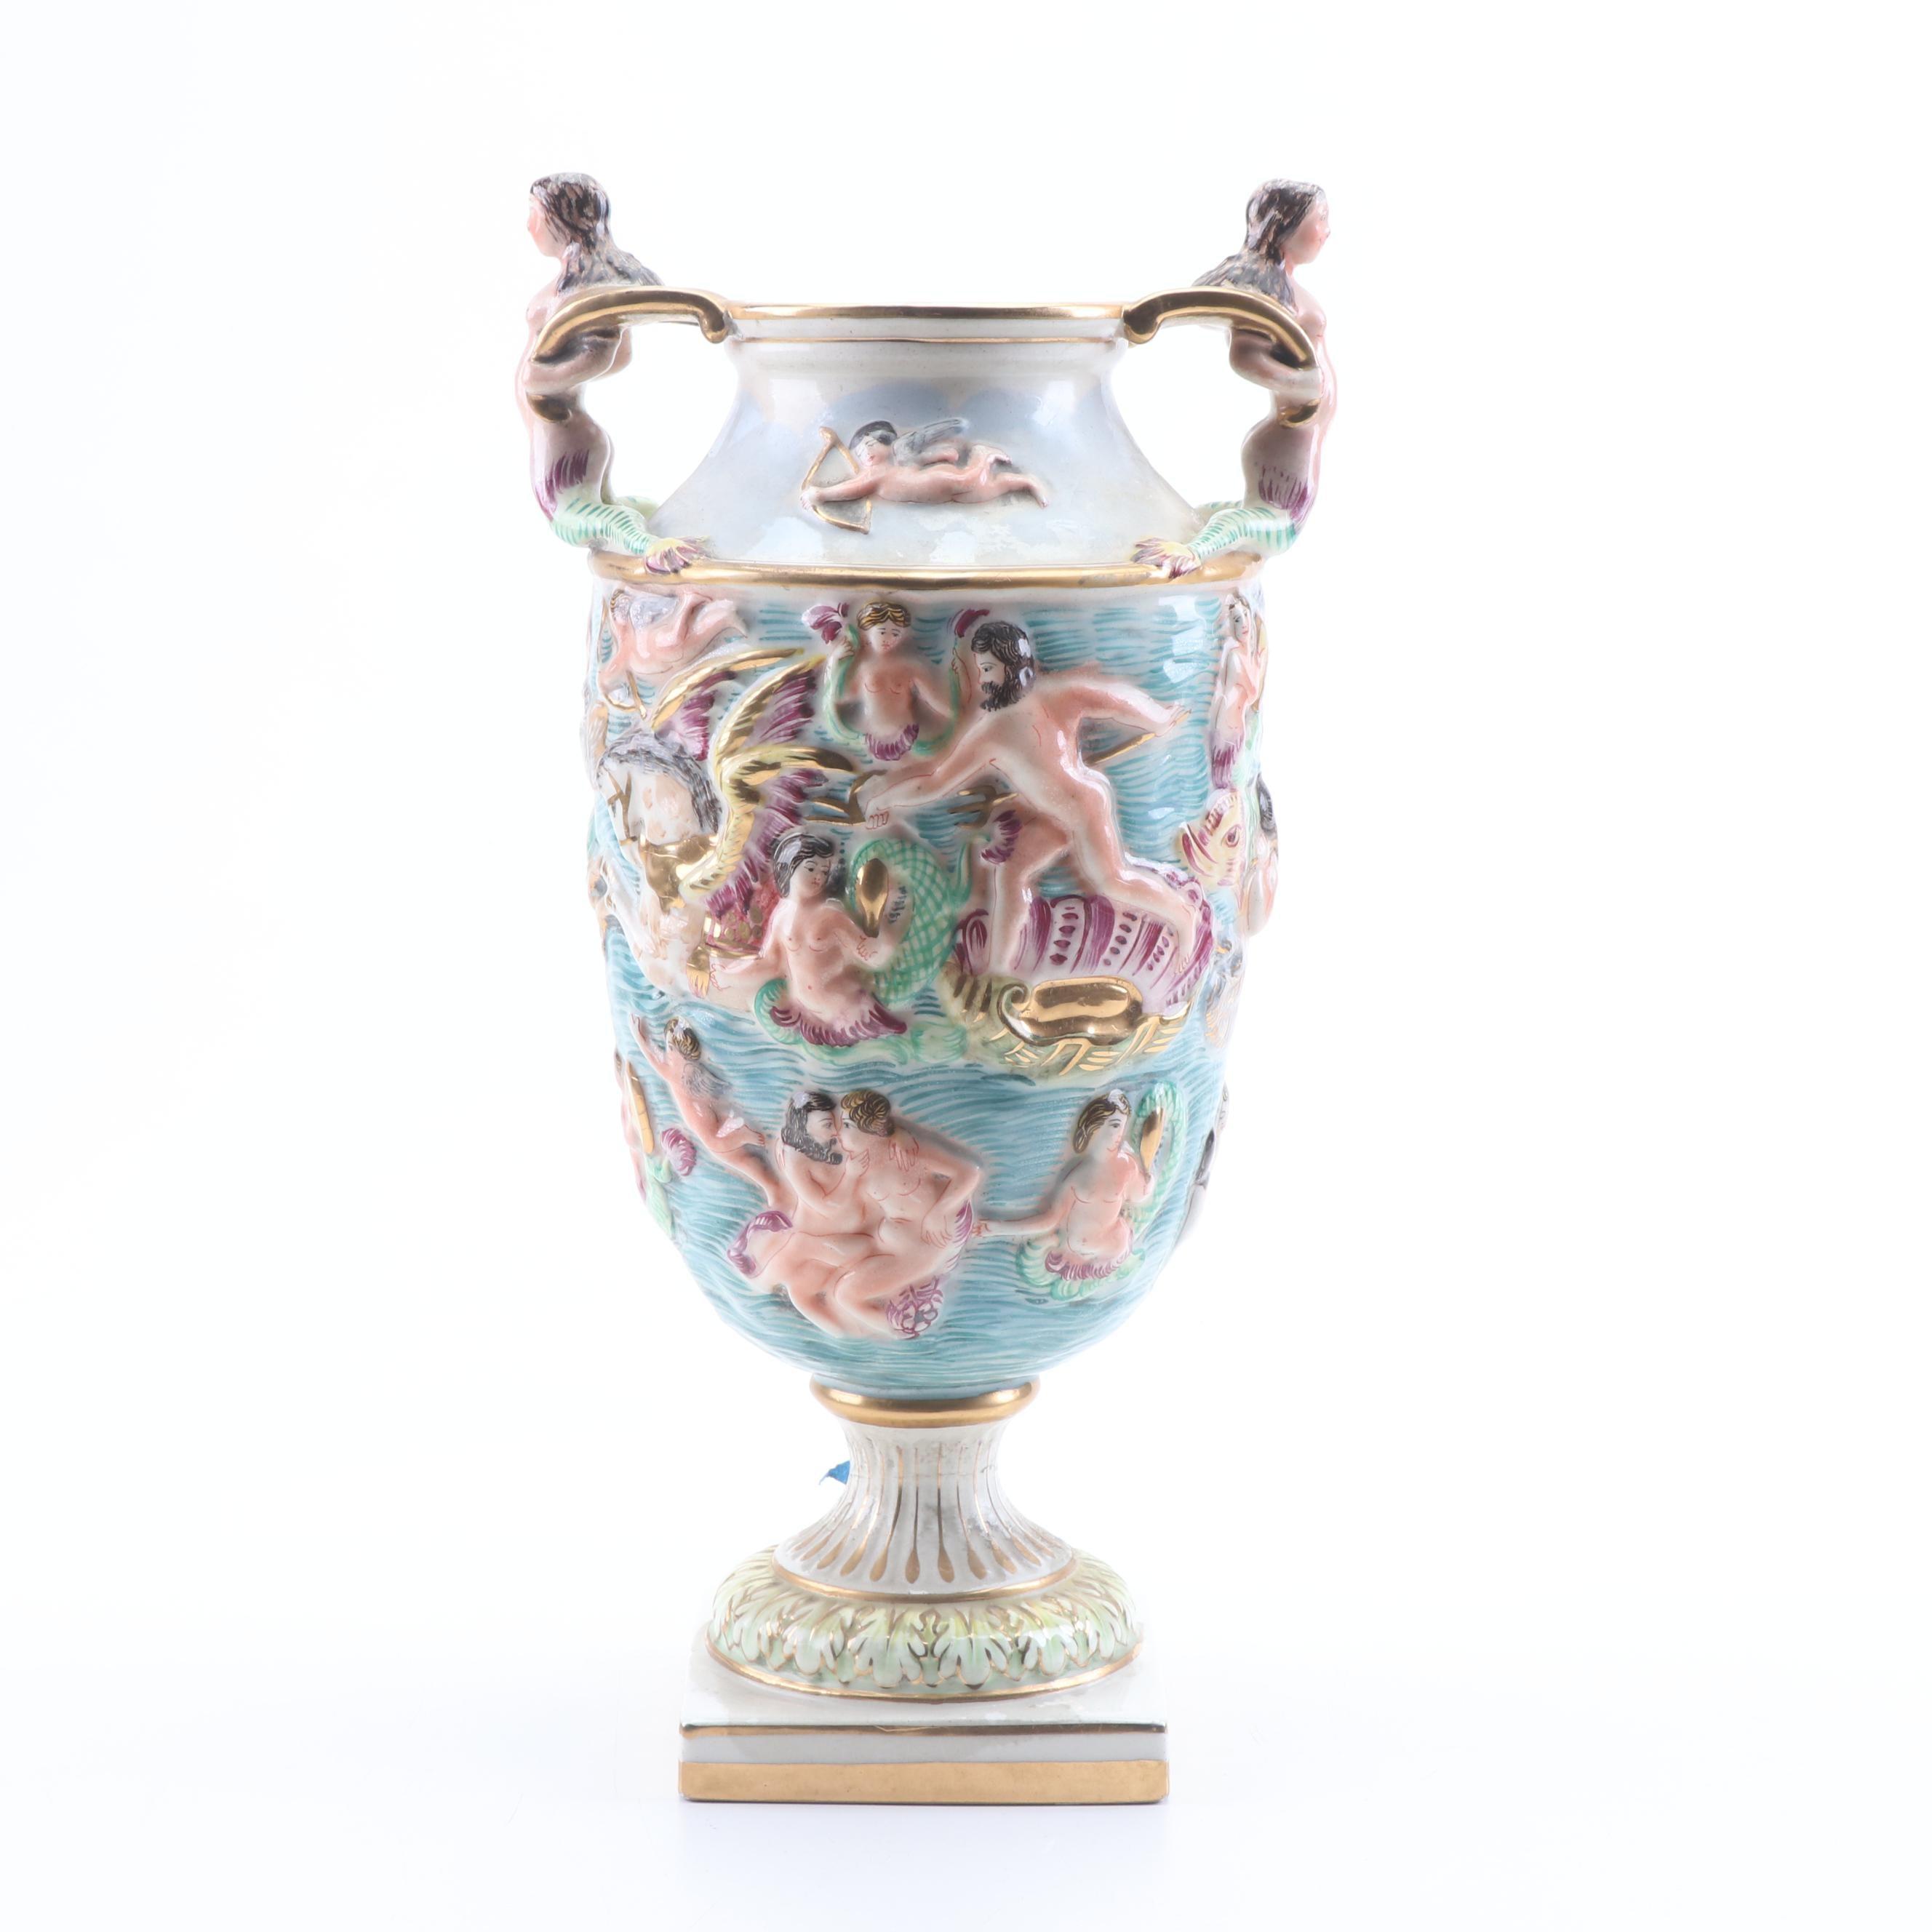 Italian Hand-Painted Capodimonte Poseidon with Mermaids Earthenware Vase